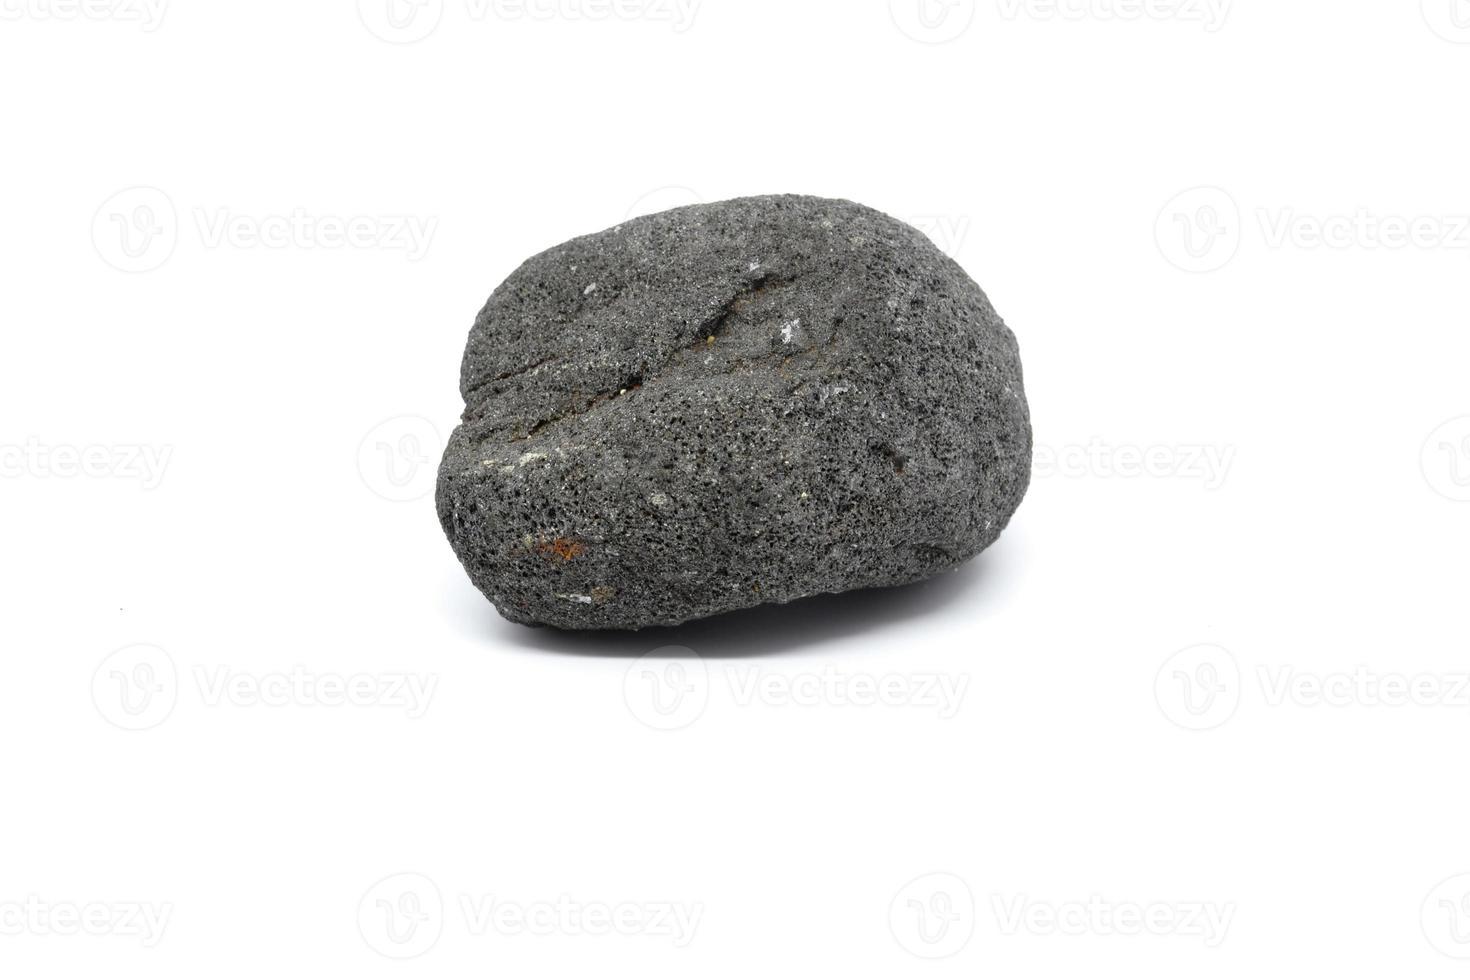 pedra de lava. seixo de pedra de lava isolado no fundo branco. Rocha ígnea. foto